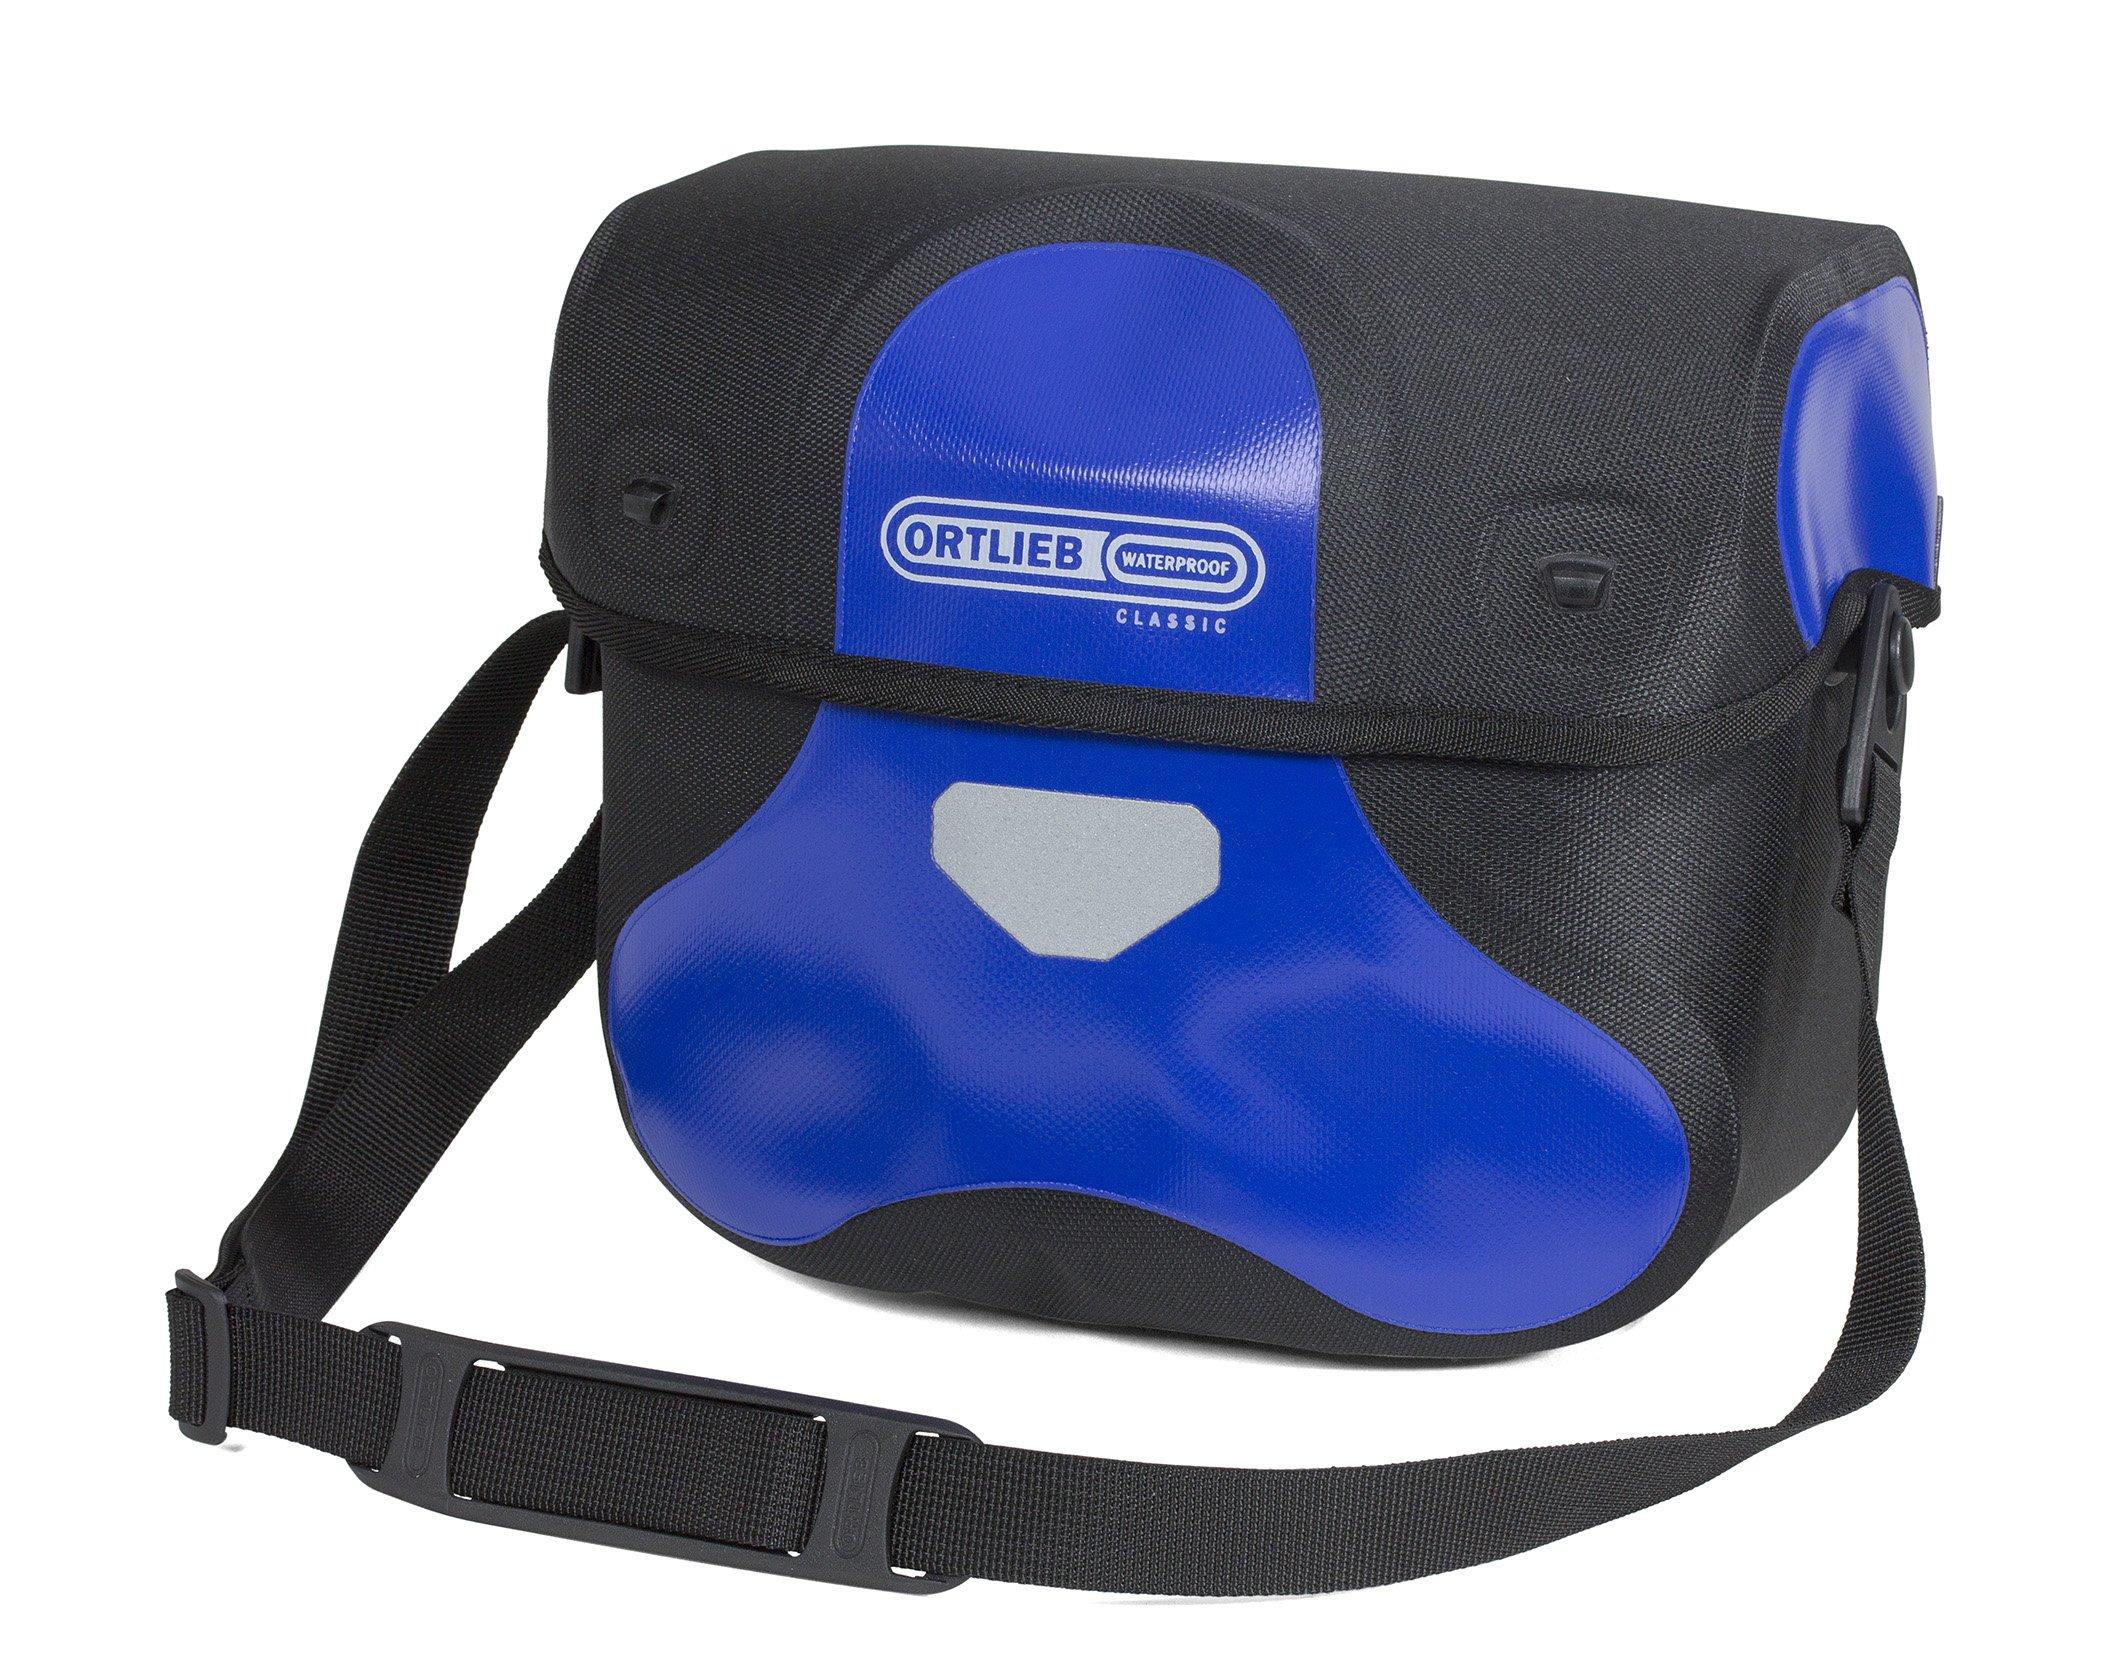 Ortlieb Ultimate 6 M Classic M Medium Handlebar Bag ULTRAMARINE-BLACK #F3108